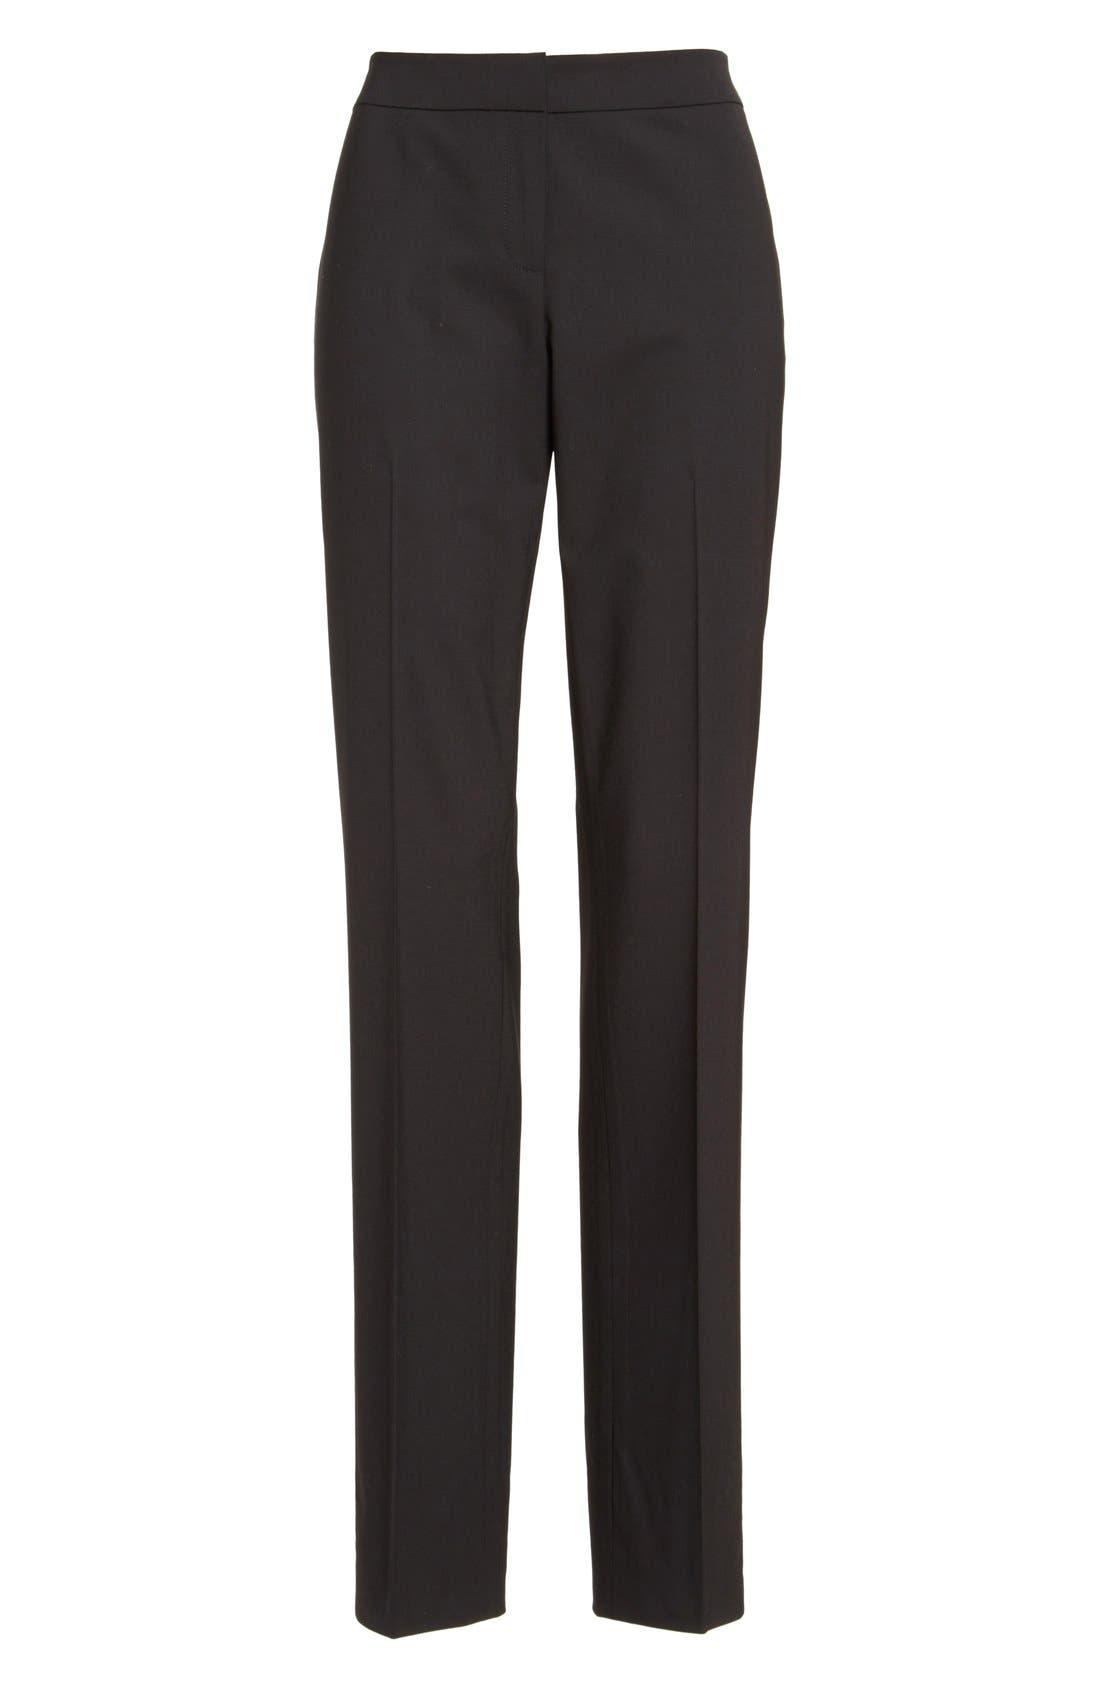 Barrow Stretch Wool Pants,                             Alternate thumbnail 8, color,                             BLACK